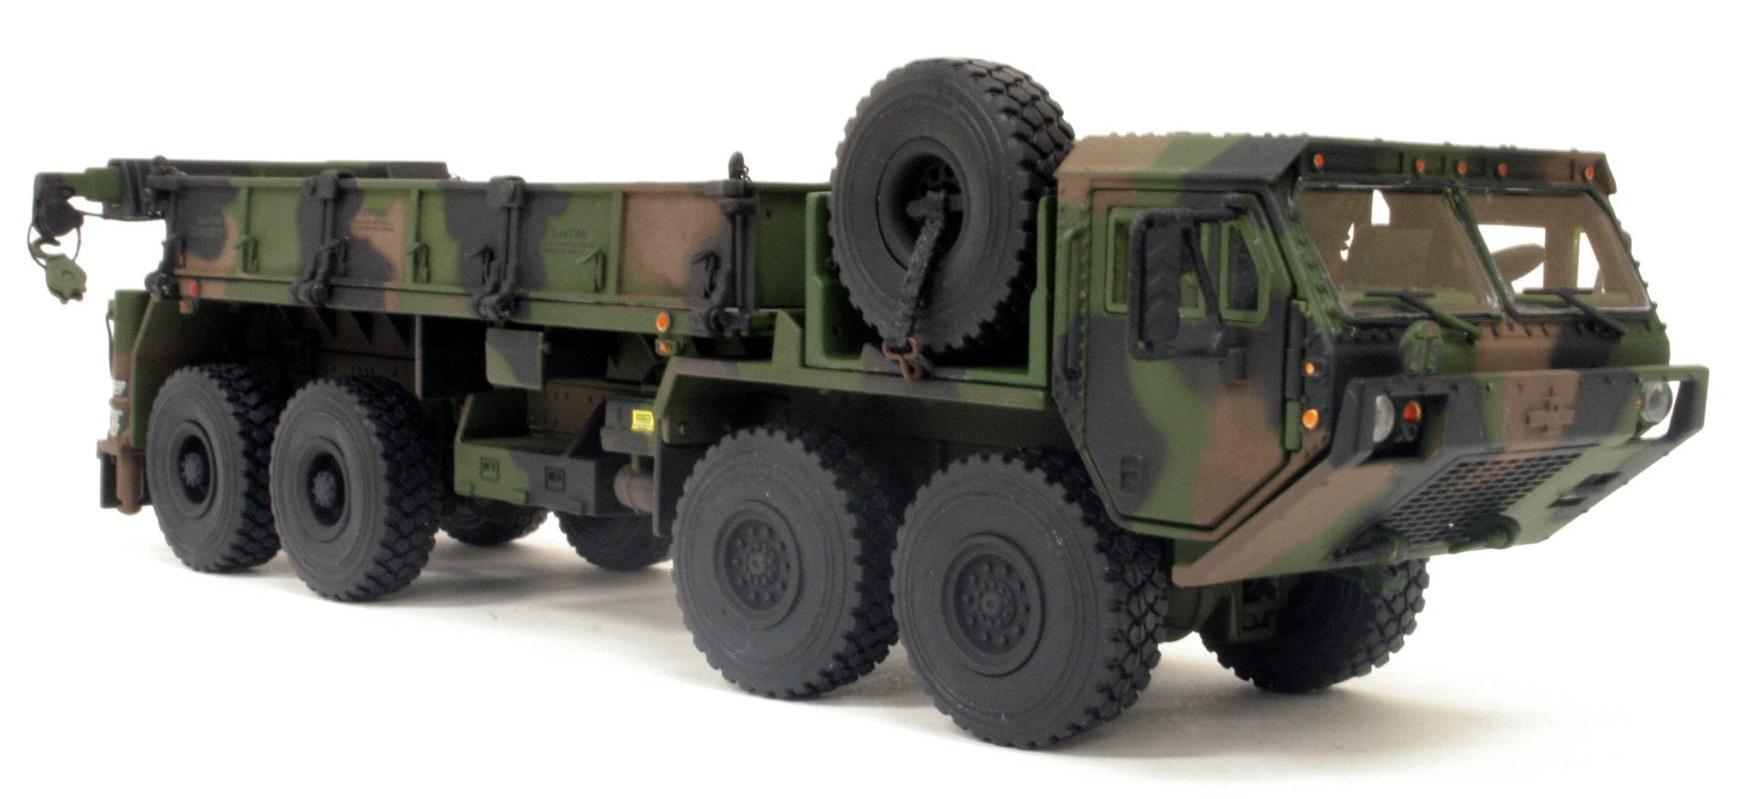 1/50 Scale Military Transport Camo TWH Oshkosh HEMTT M985 A2 Cargo Truck Diecast Model.